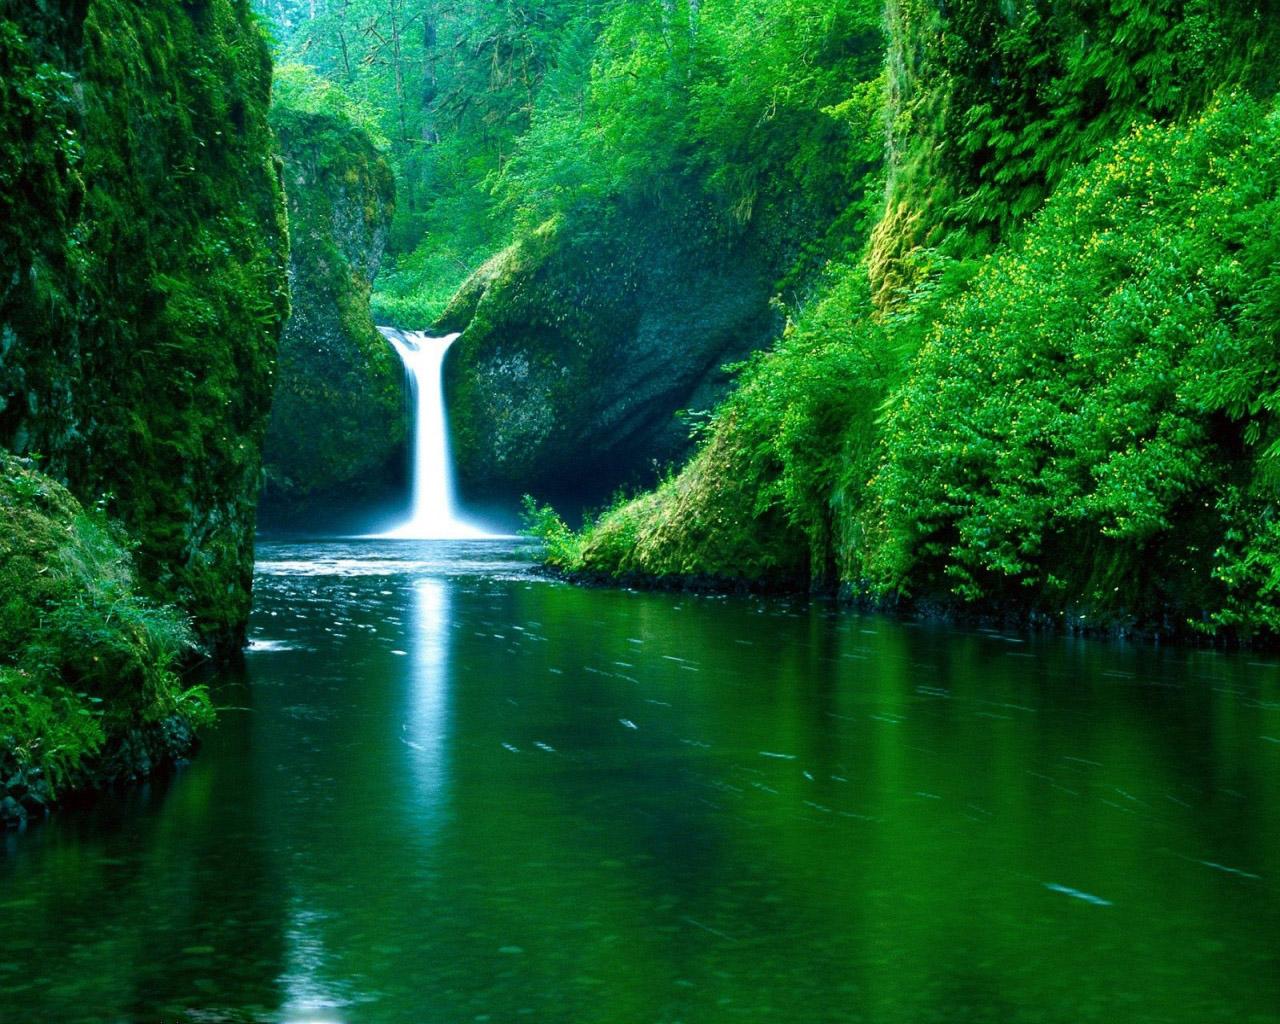 ulgobang wallpaper desktop nature beauty 1280x1024